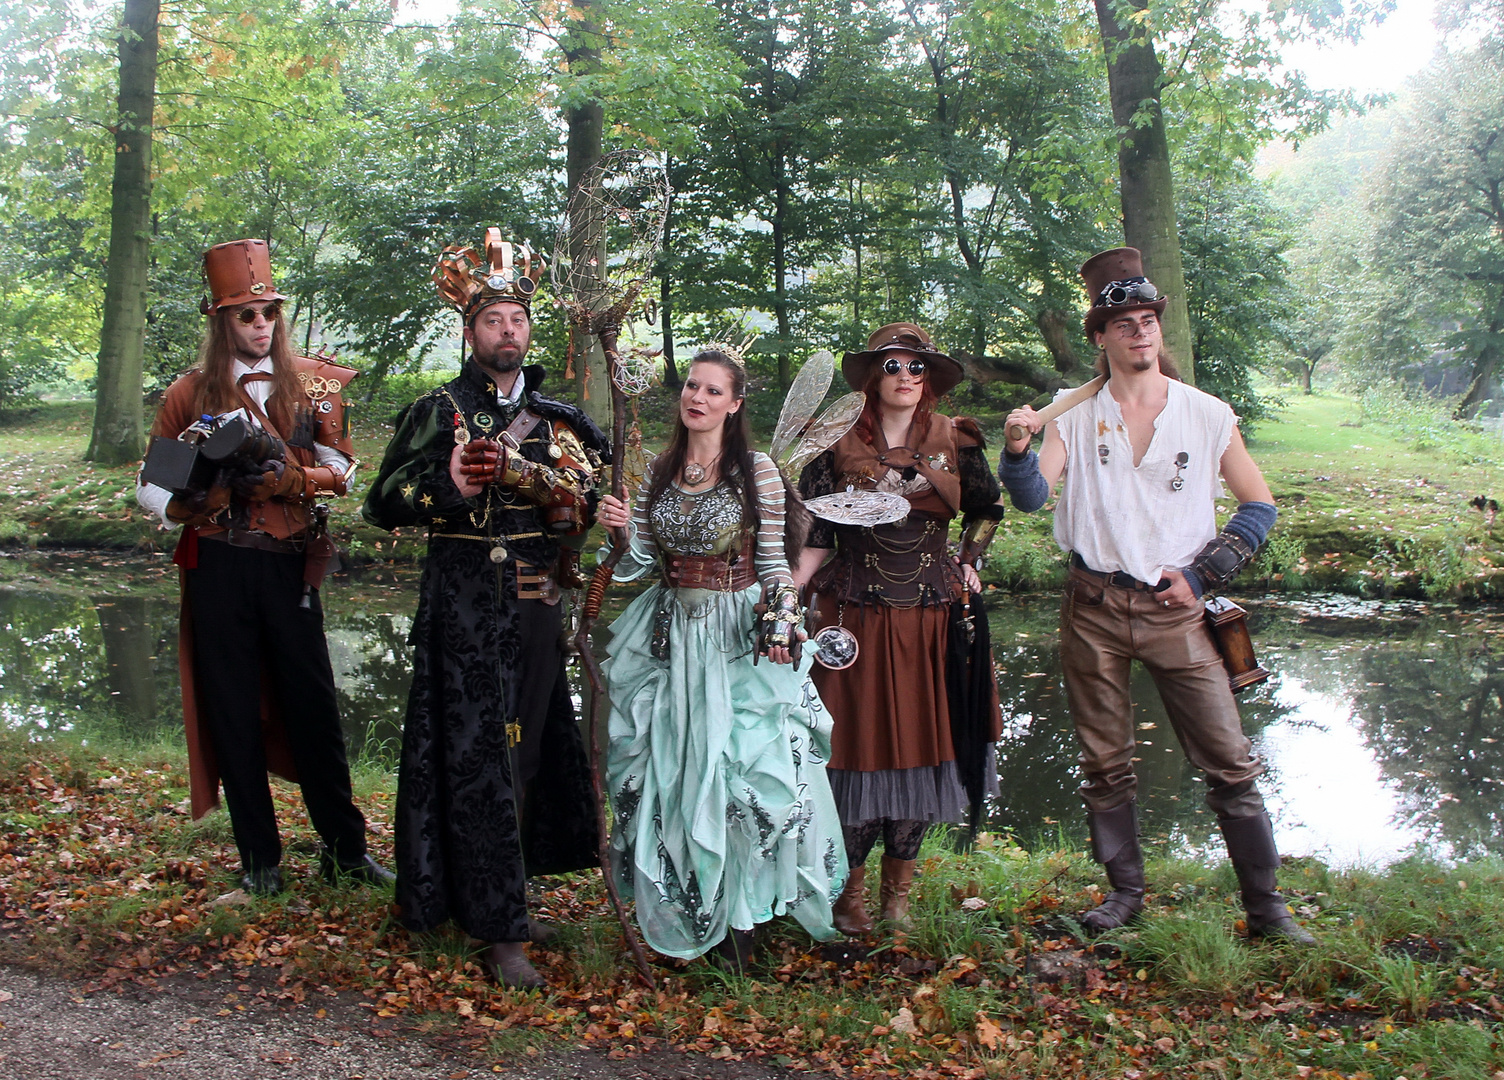 Elf Fantasy Fair 2014 Arcen -6-